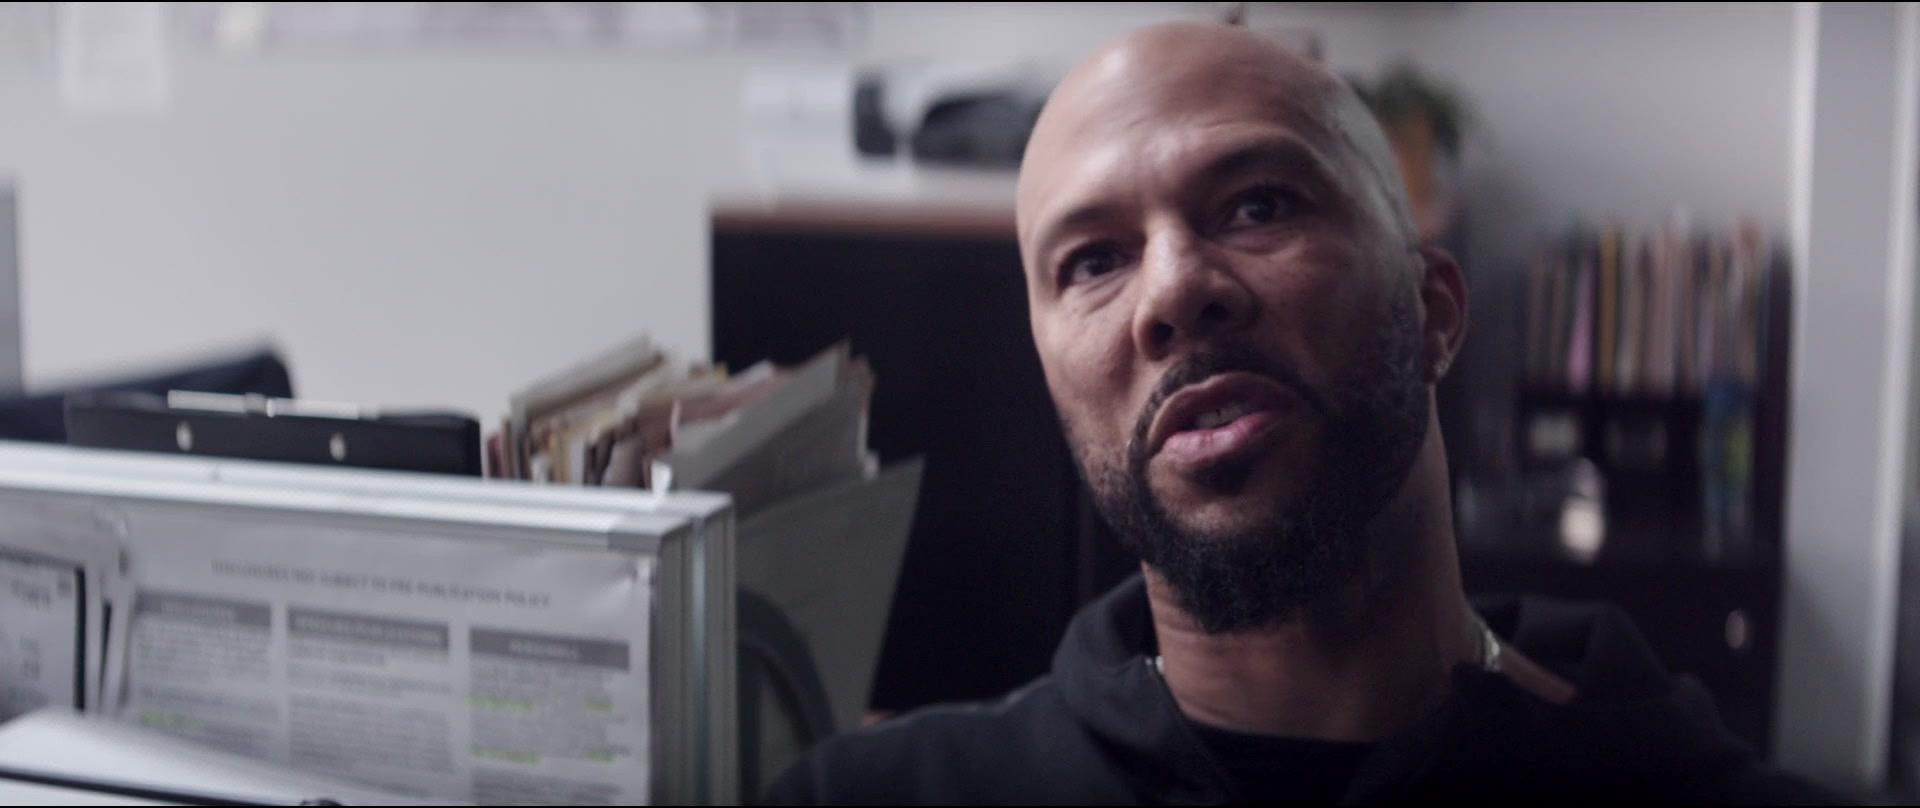 The Informer 2019 1080p BluRay X264-AMIABLE